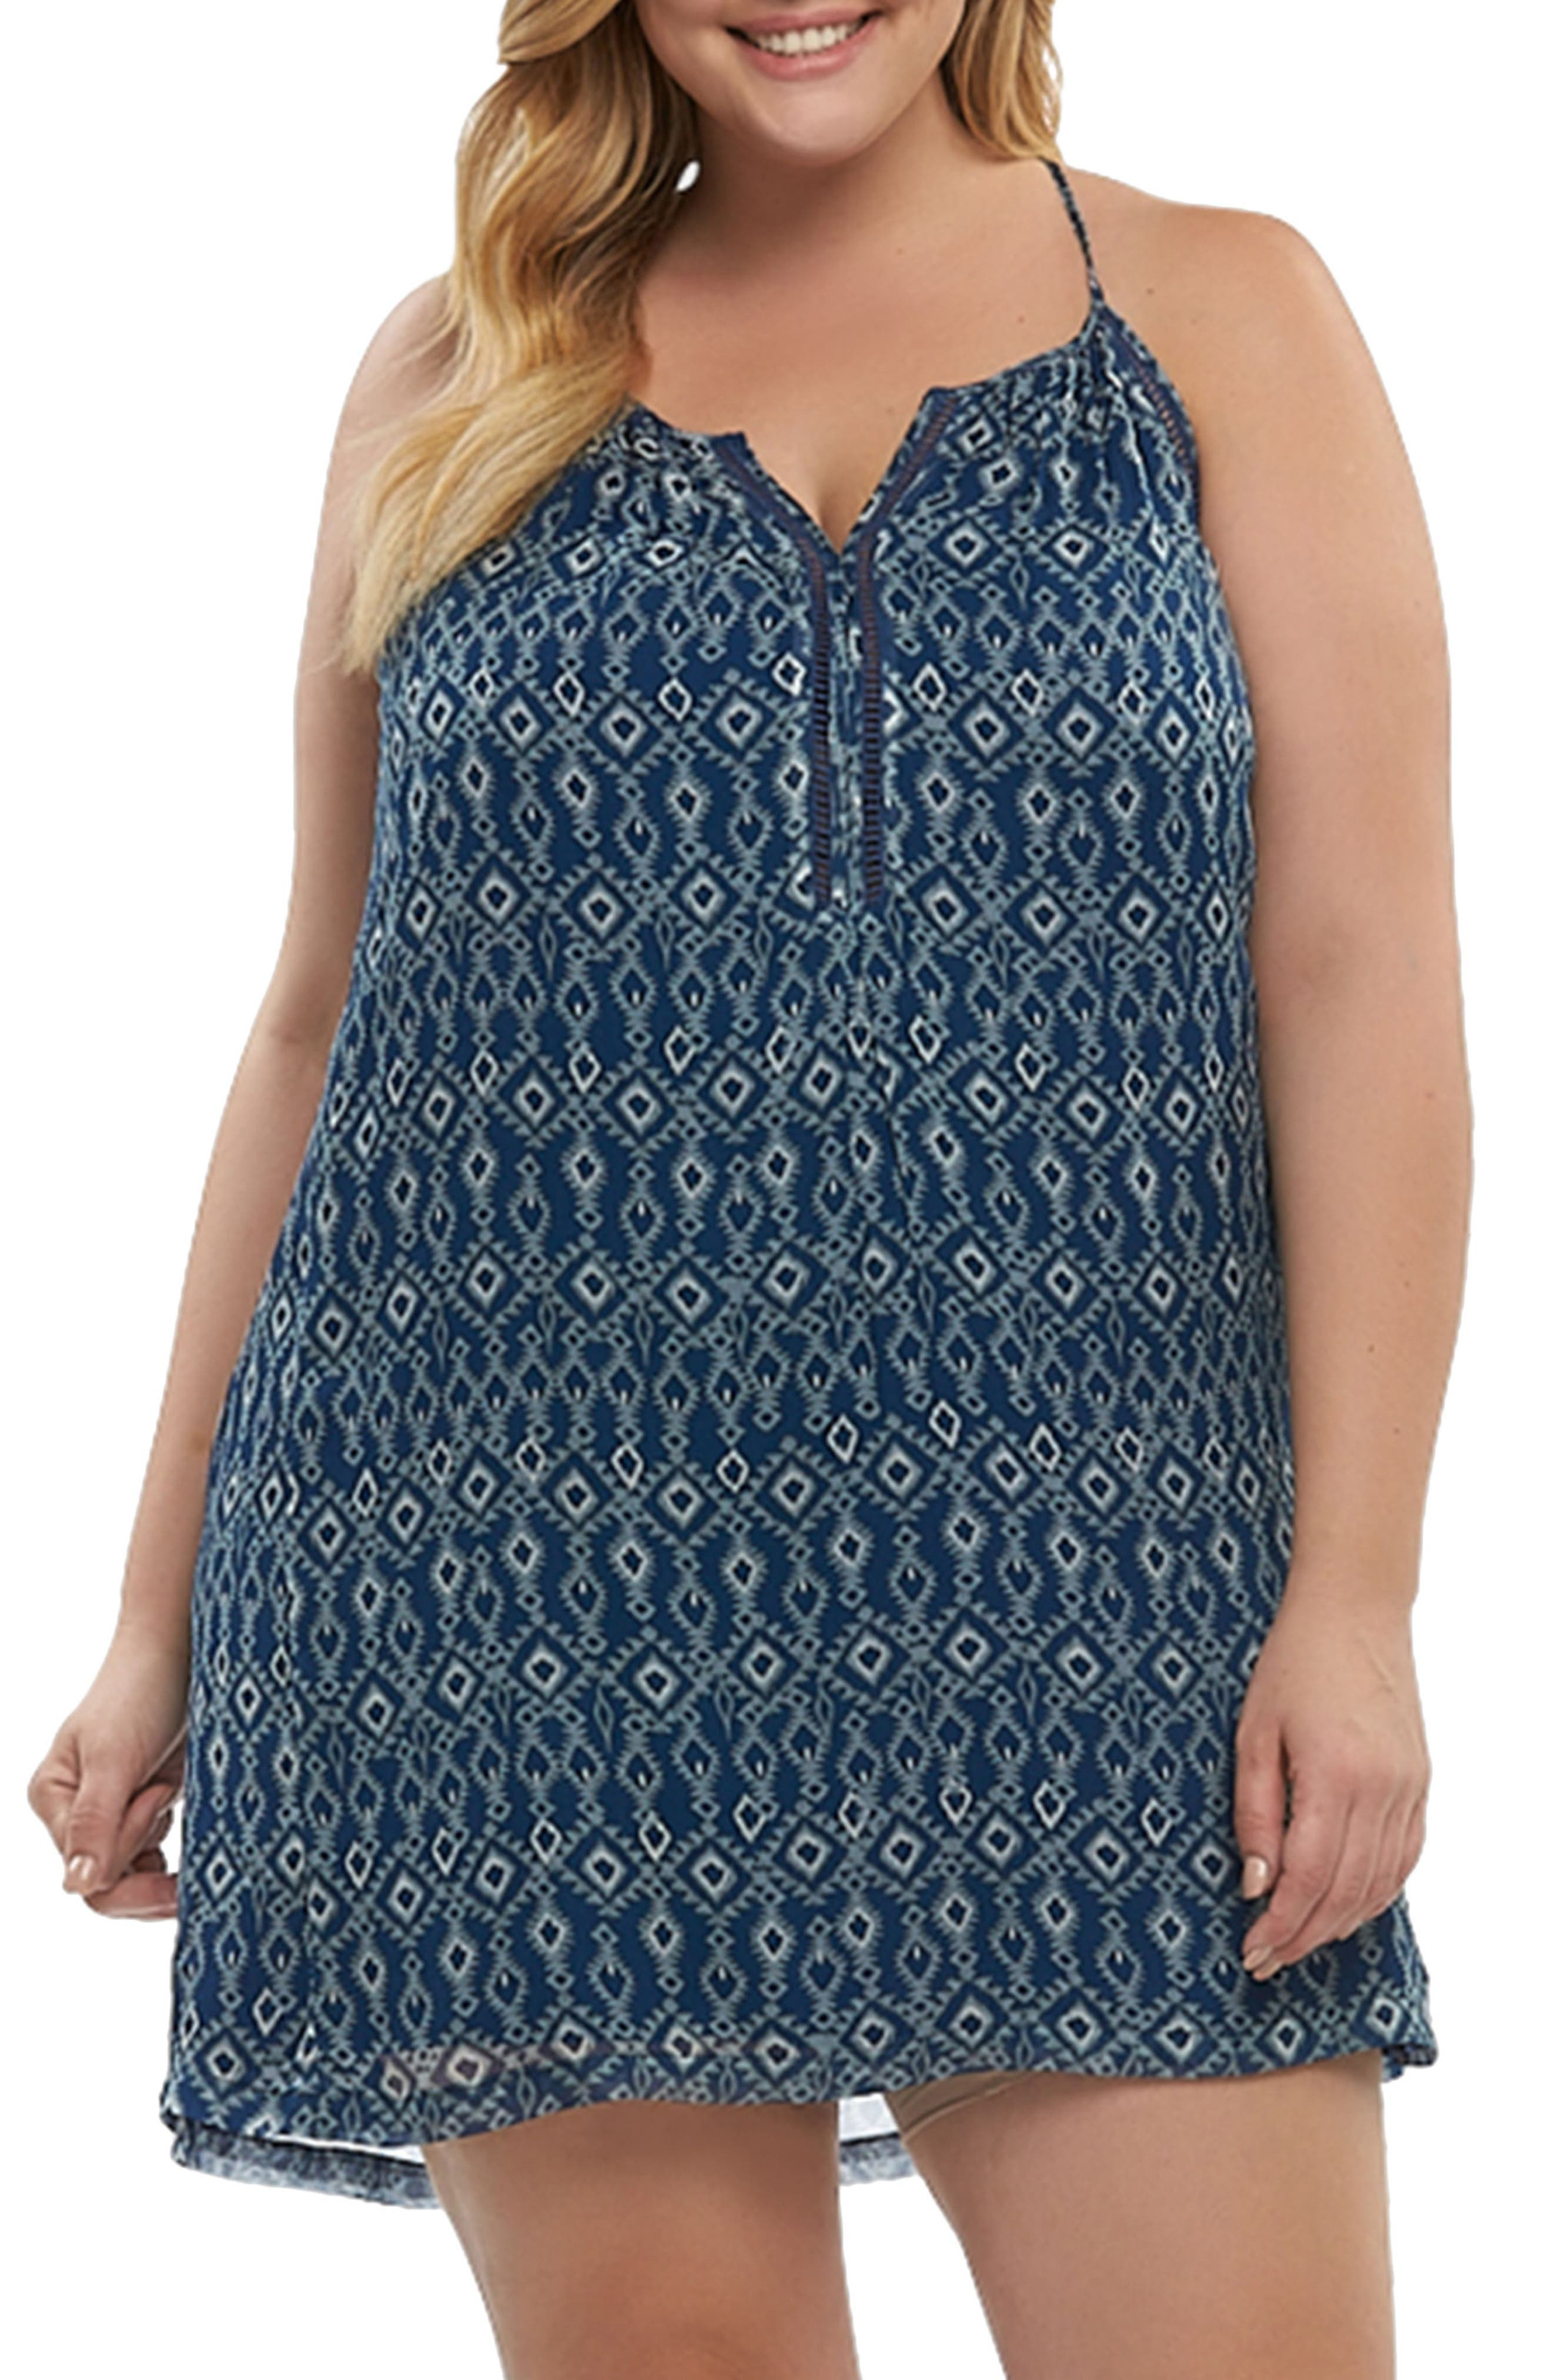 Alternate Image 1 Selected - Tart Athena Print Cover-Up Dress (Plus Size)